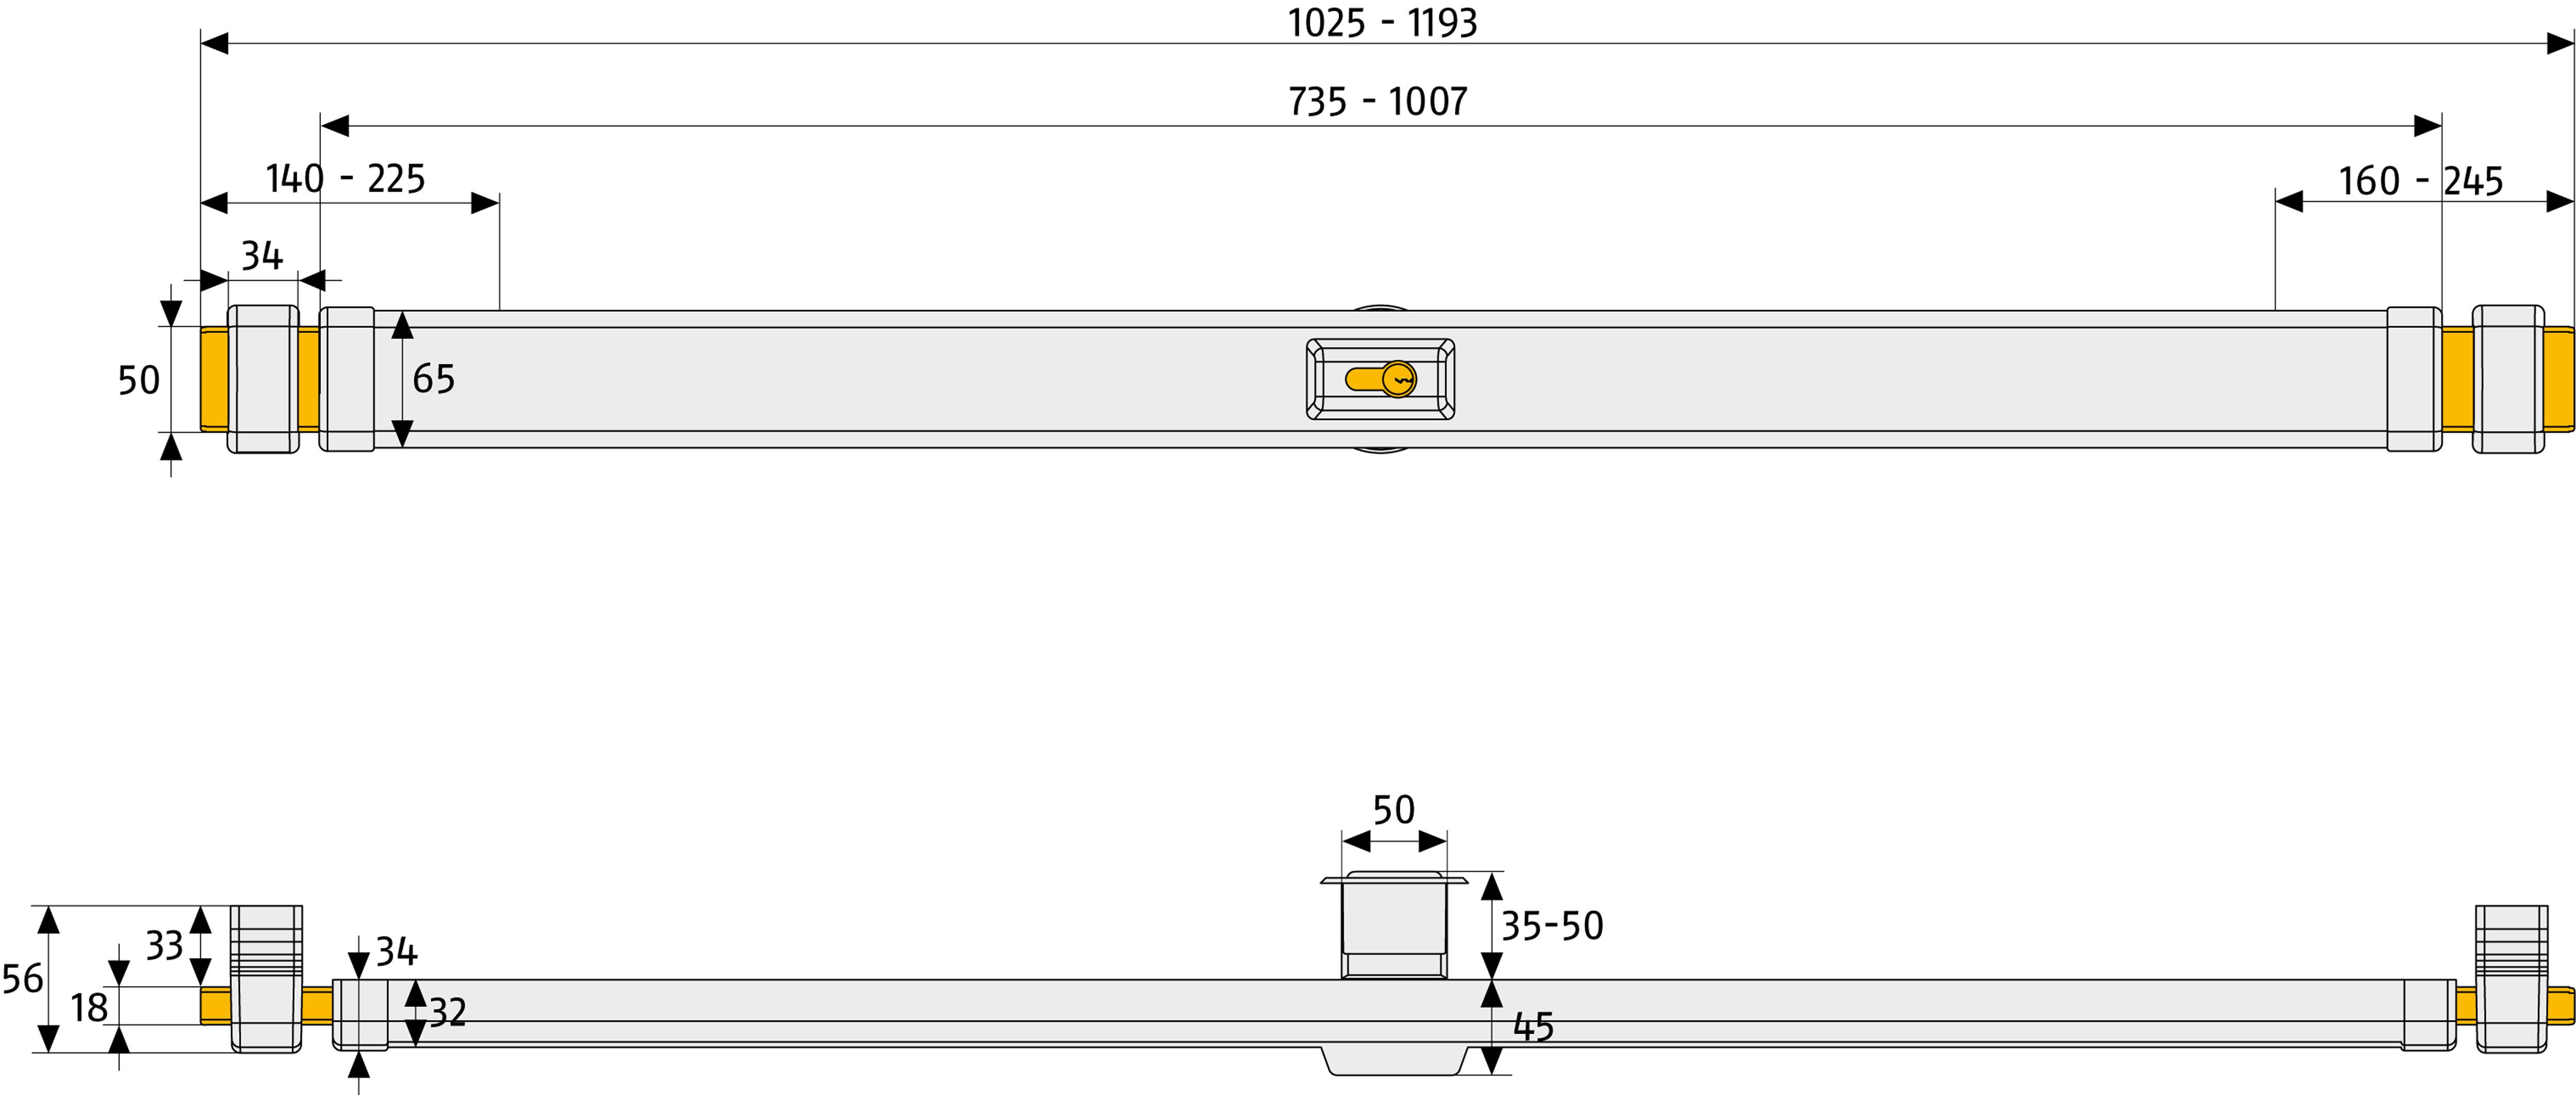 abus panzerriegel 2600 jw07 kyushucon. Black Bedroom Furniture Sets. Home Design Ideas